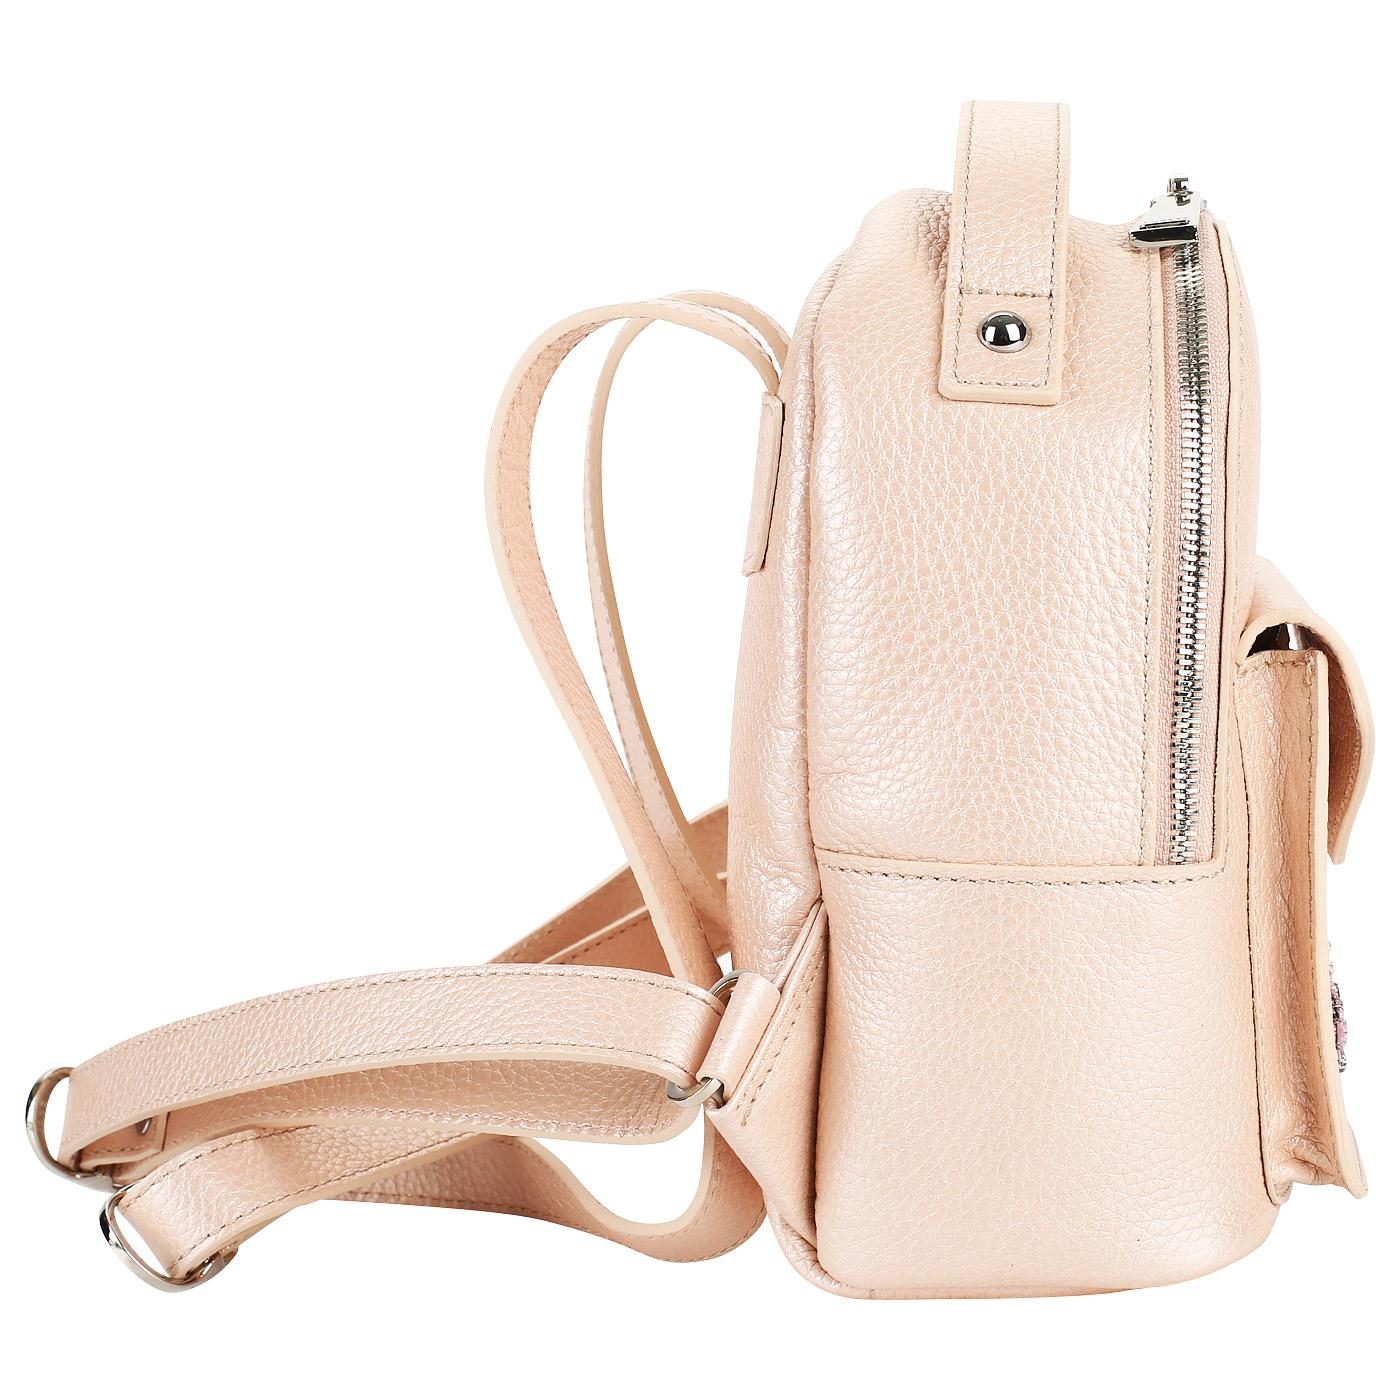 5b5bb06c5121 Маленький кожаный рюкзак с аппликацией Chatte DB9225_rose metal ...